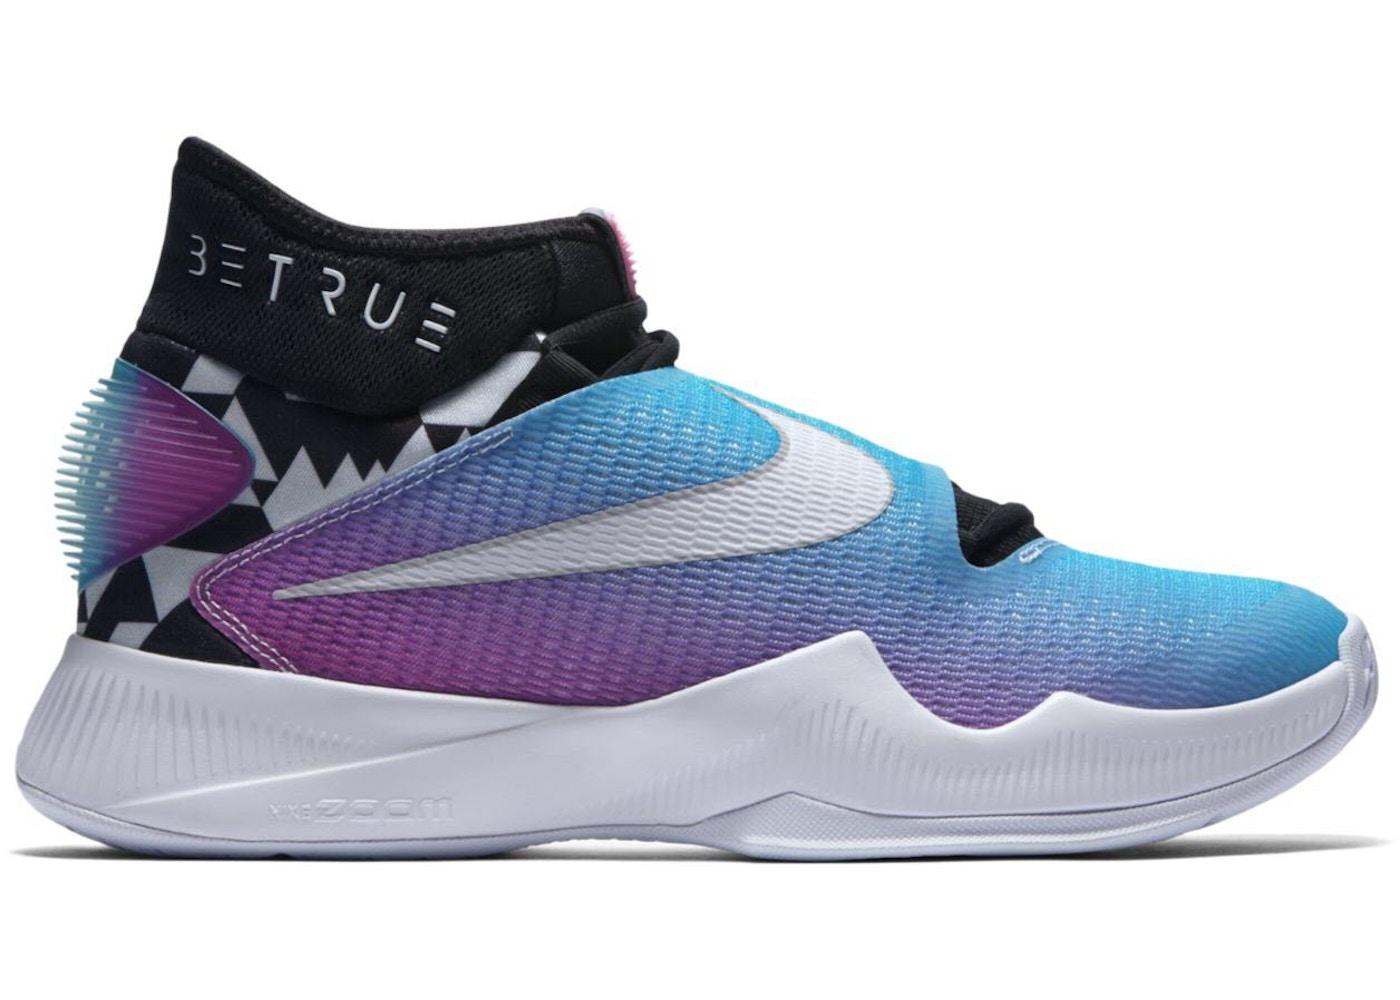 sports shoes 20c03 60d72 Nike HyperRev 2016 Be True - 853720-618